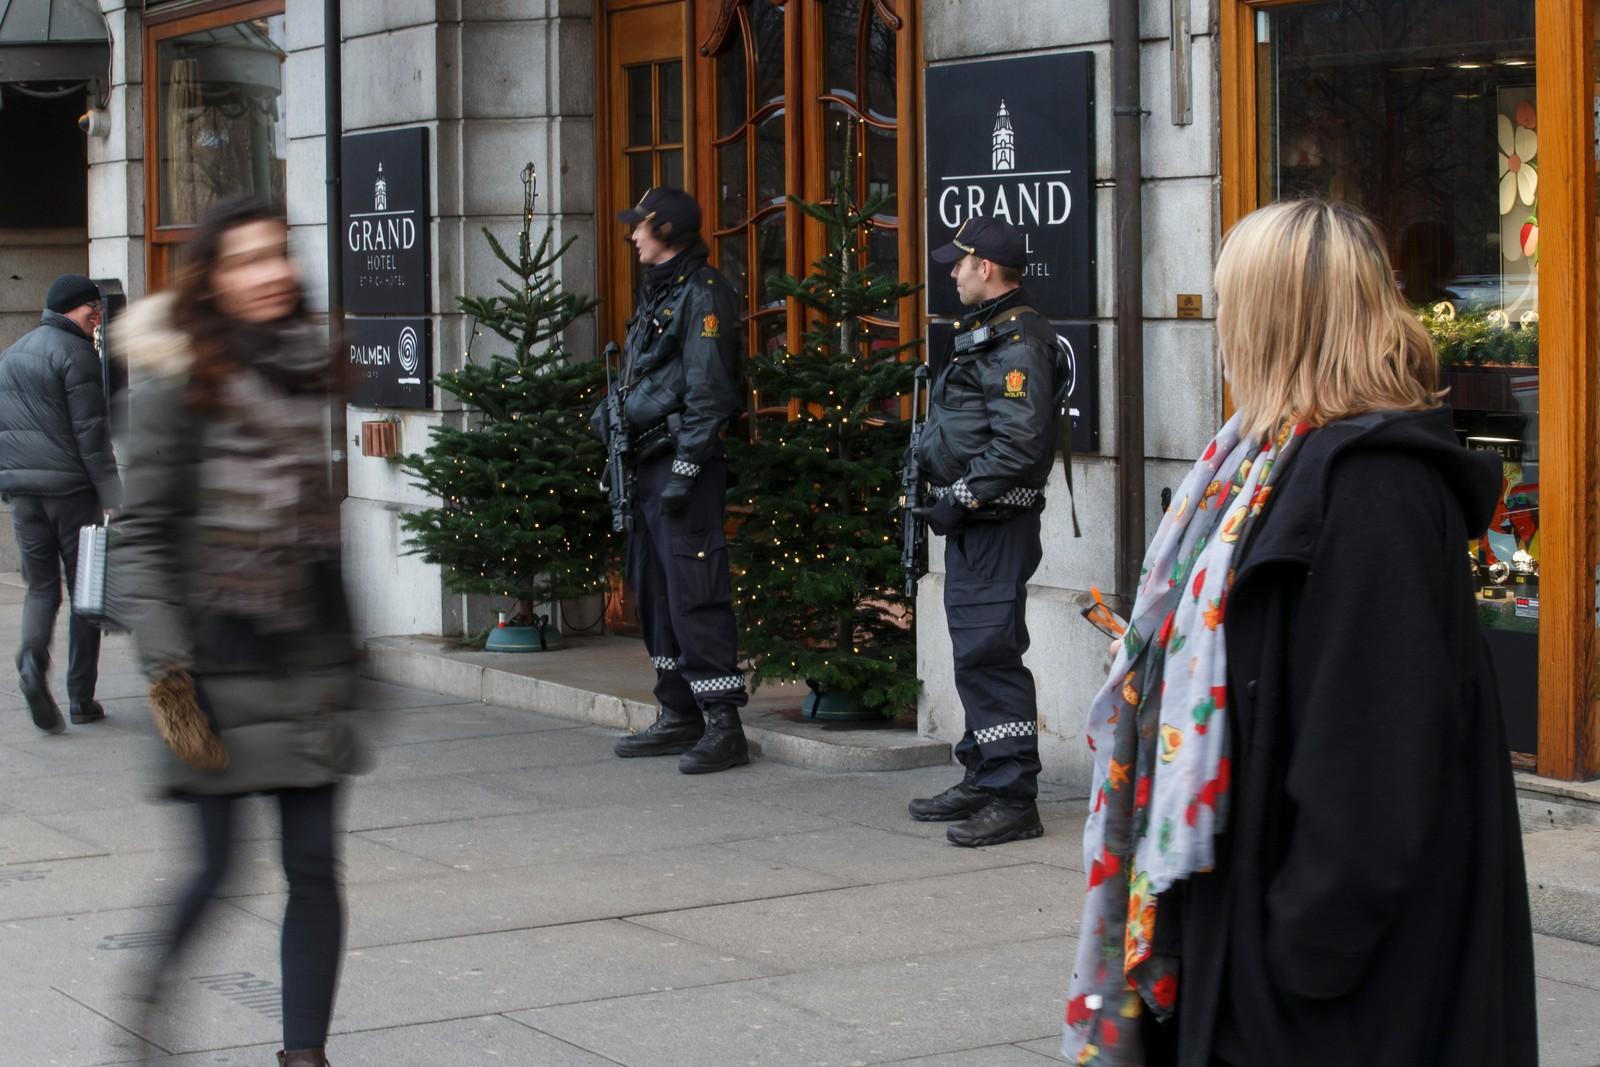 HER BOR VINNERNE: Sikkerhet rundt Grand Hotel i Oslo der fredsprisvinnerne Kailash Satyarthi og Malala Yousafzai bor.